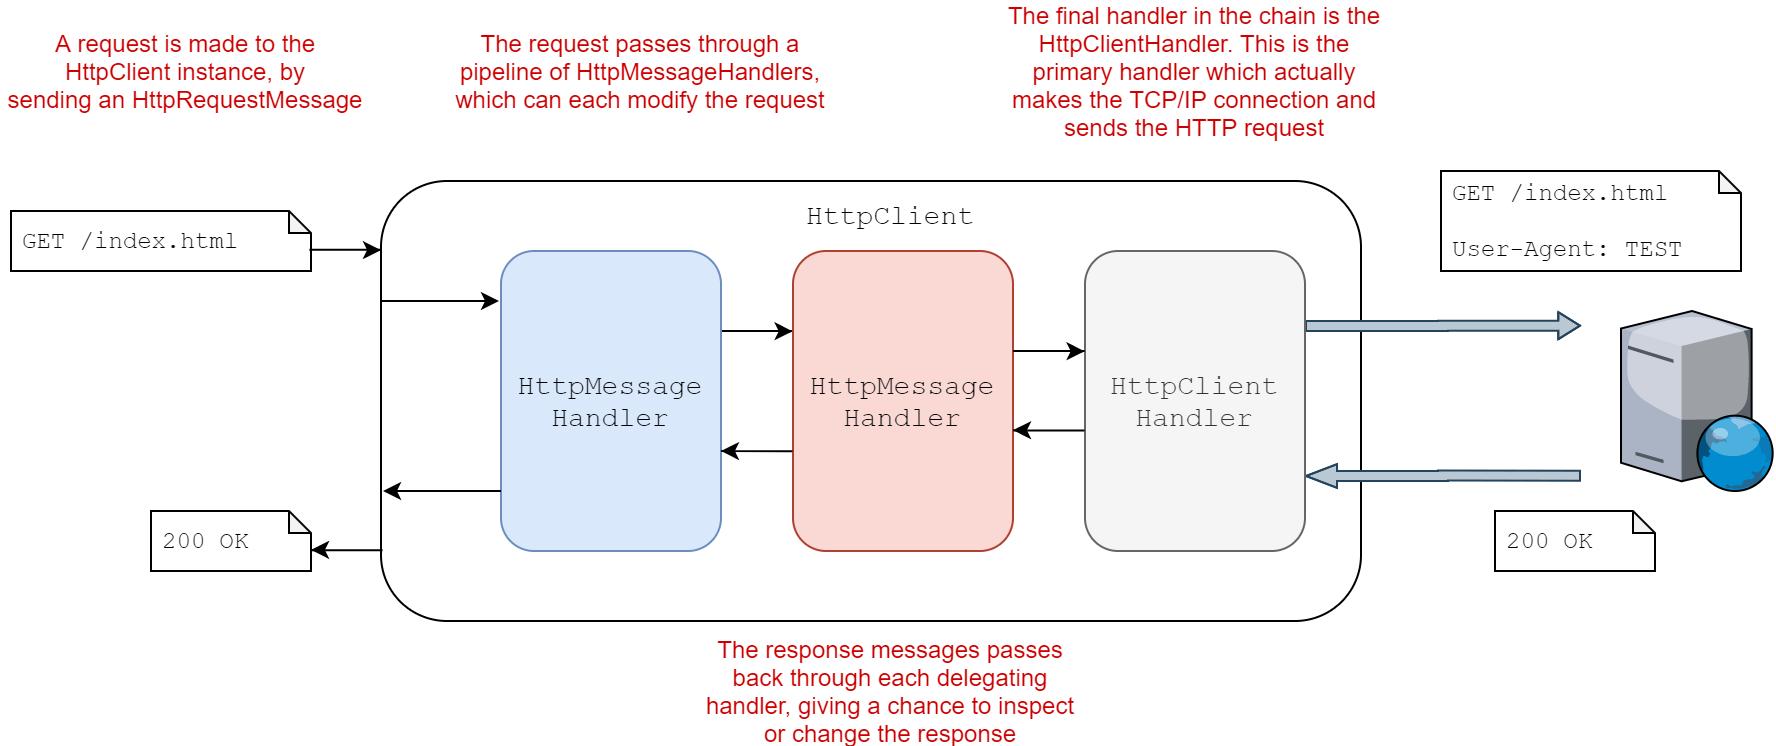 Exploring the code behind IHttpClientFactory in depth